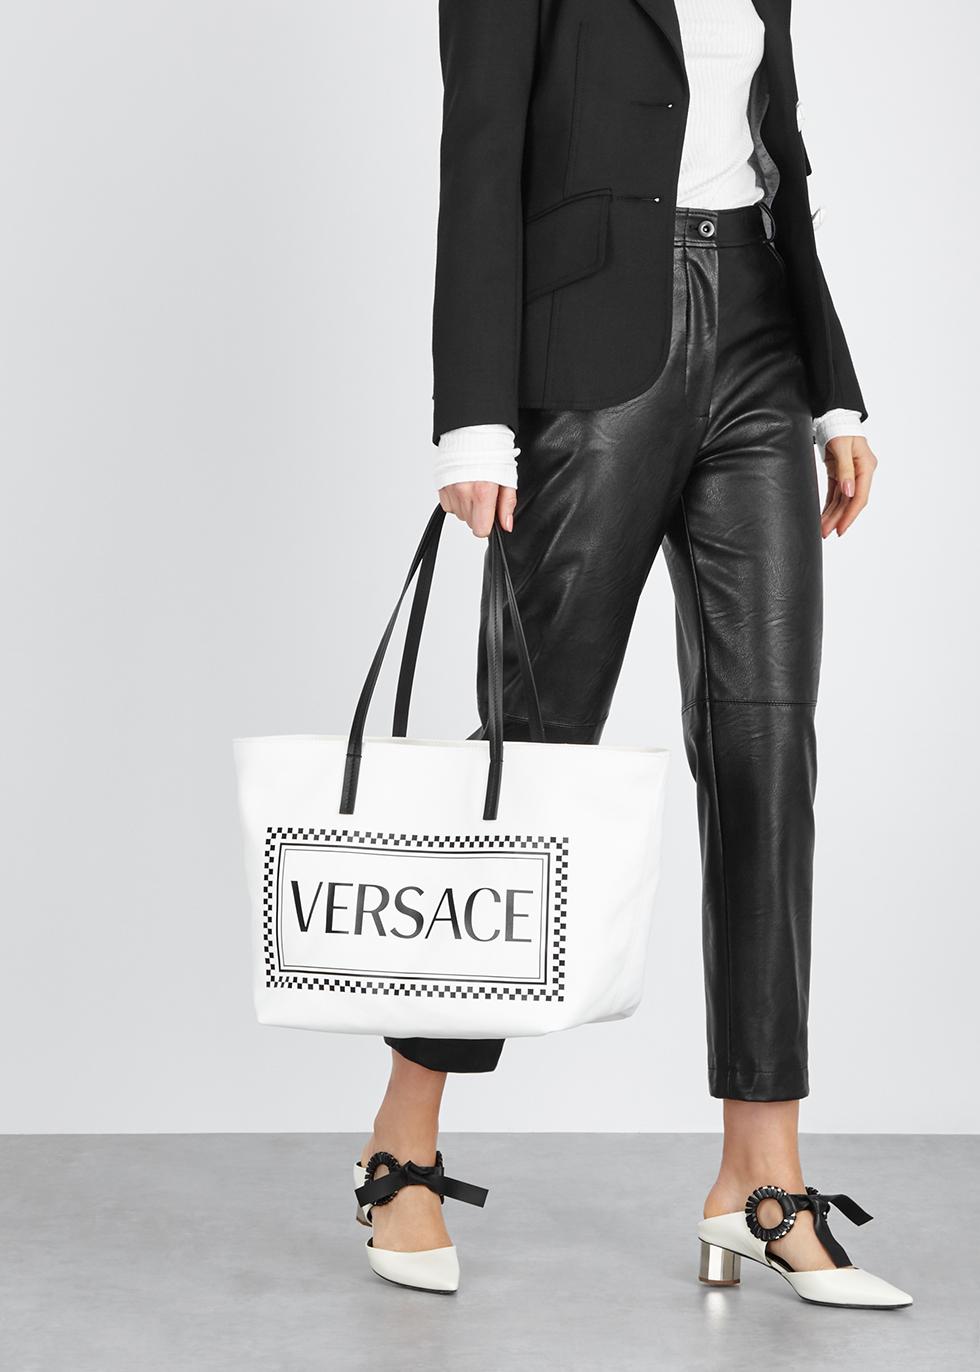 8c75cf15b7 Versace - Harvey Nichols